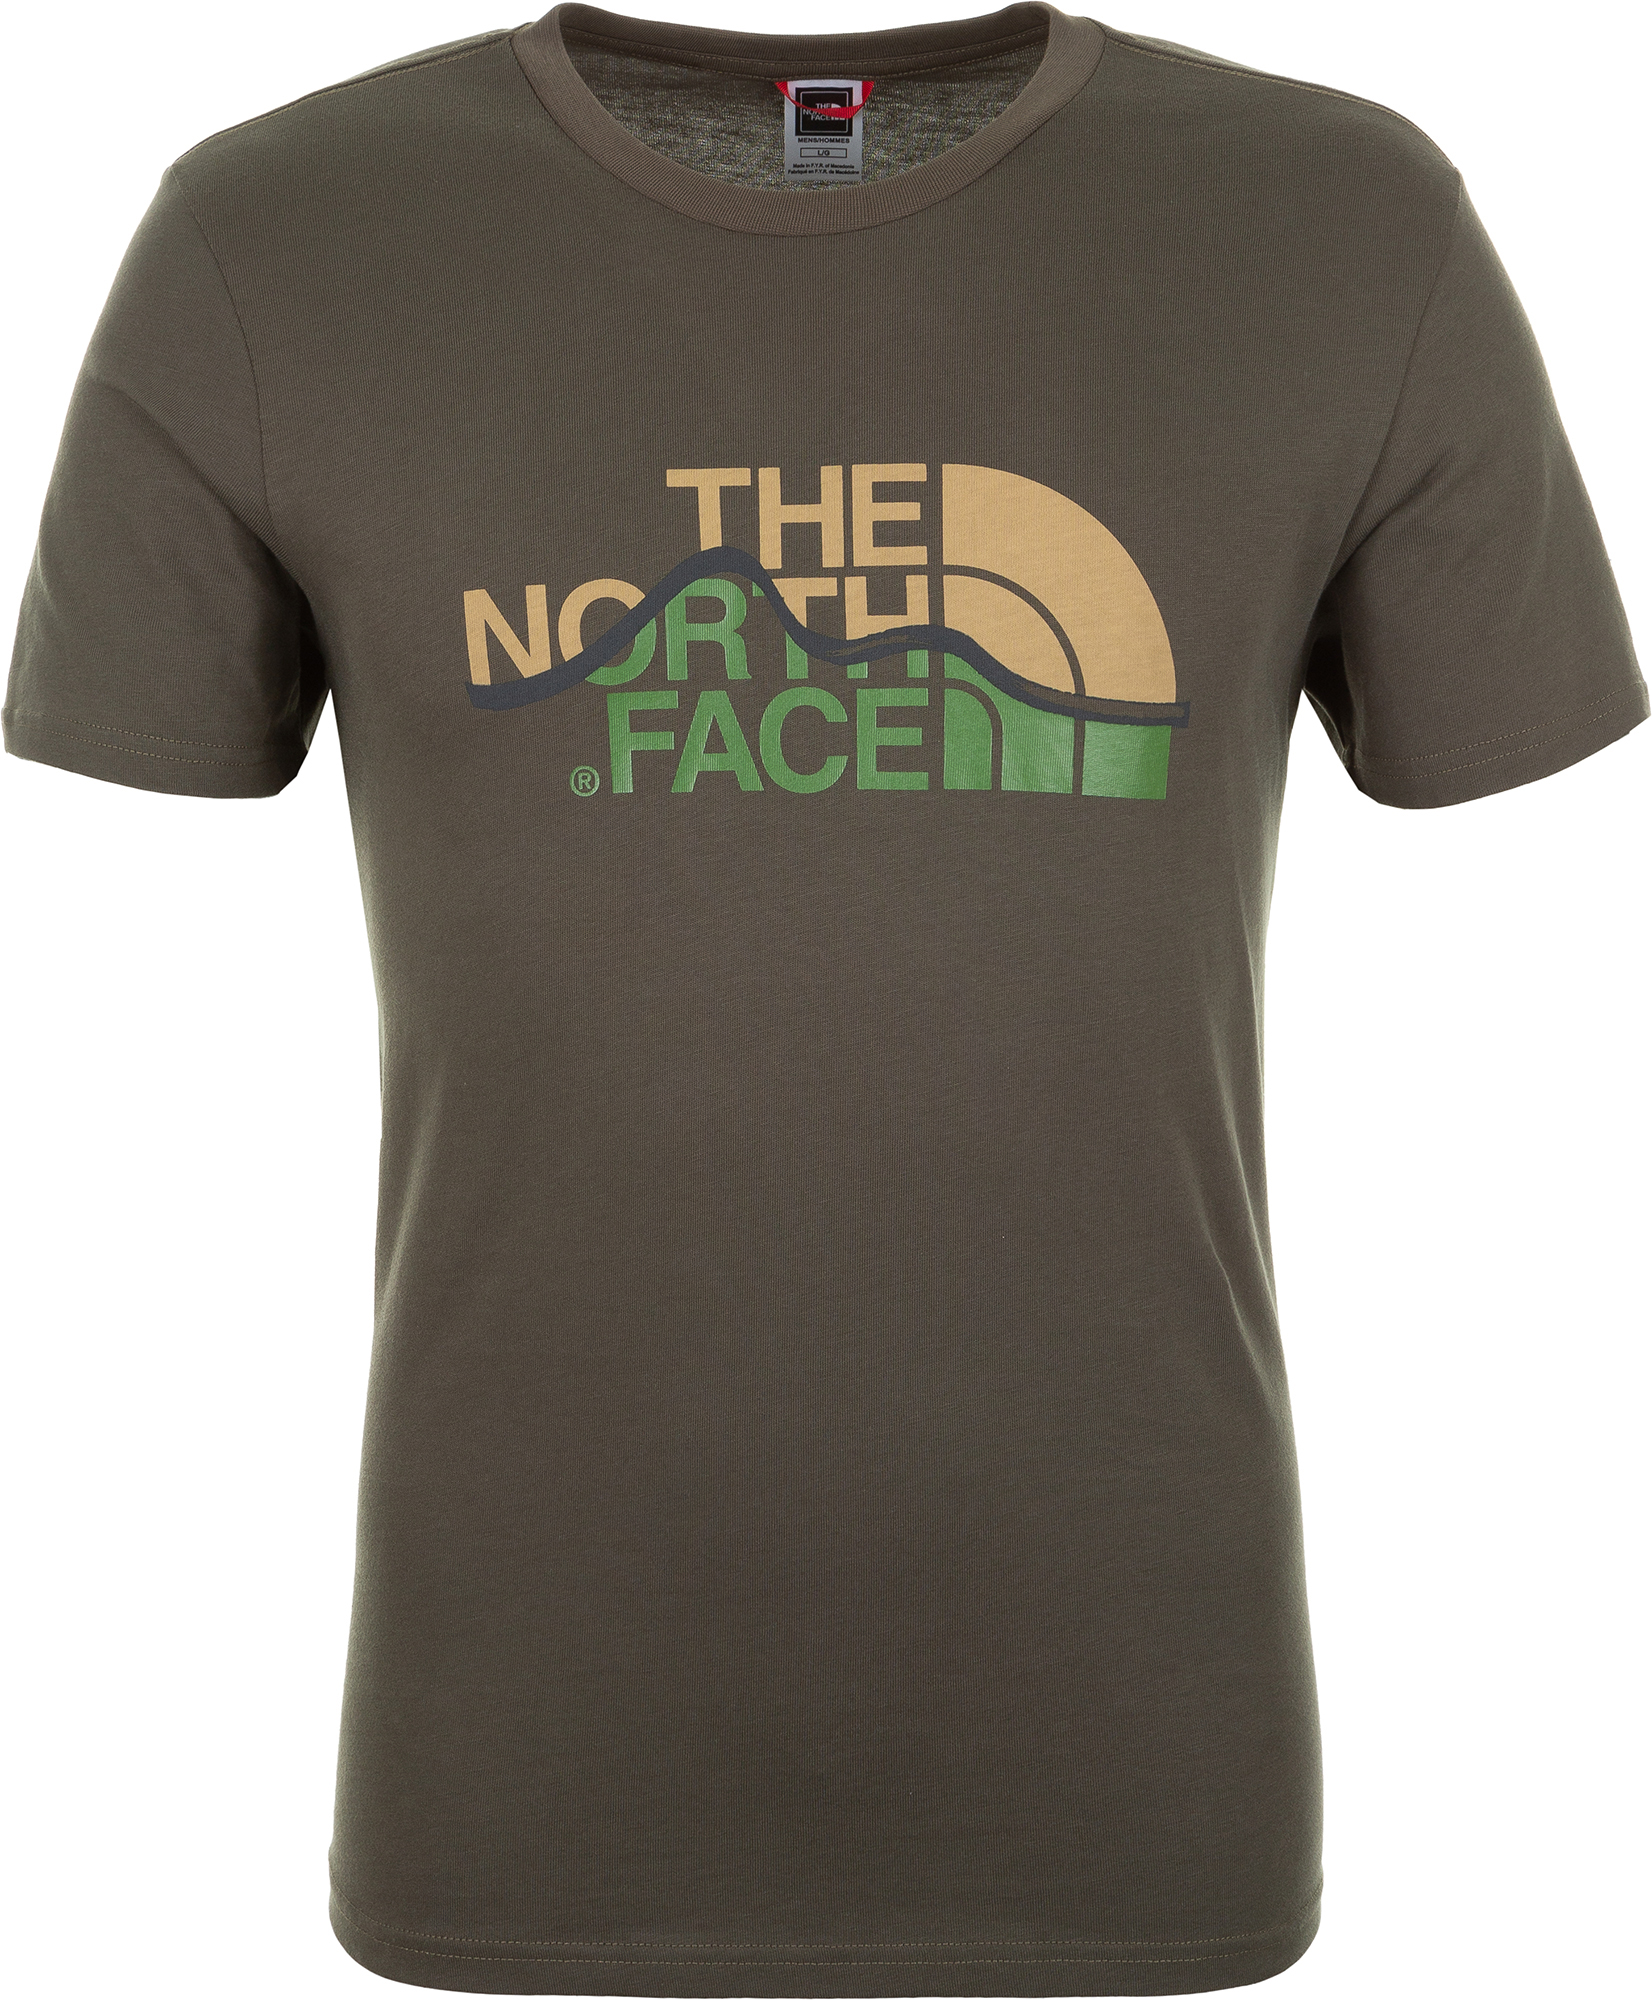 The North Face Футболка мужская Mountain Line, размер 52